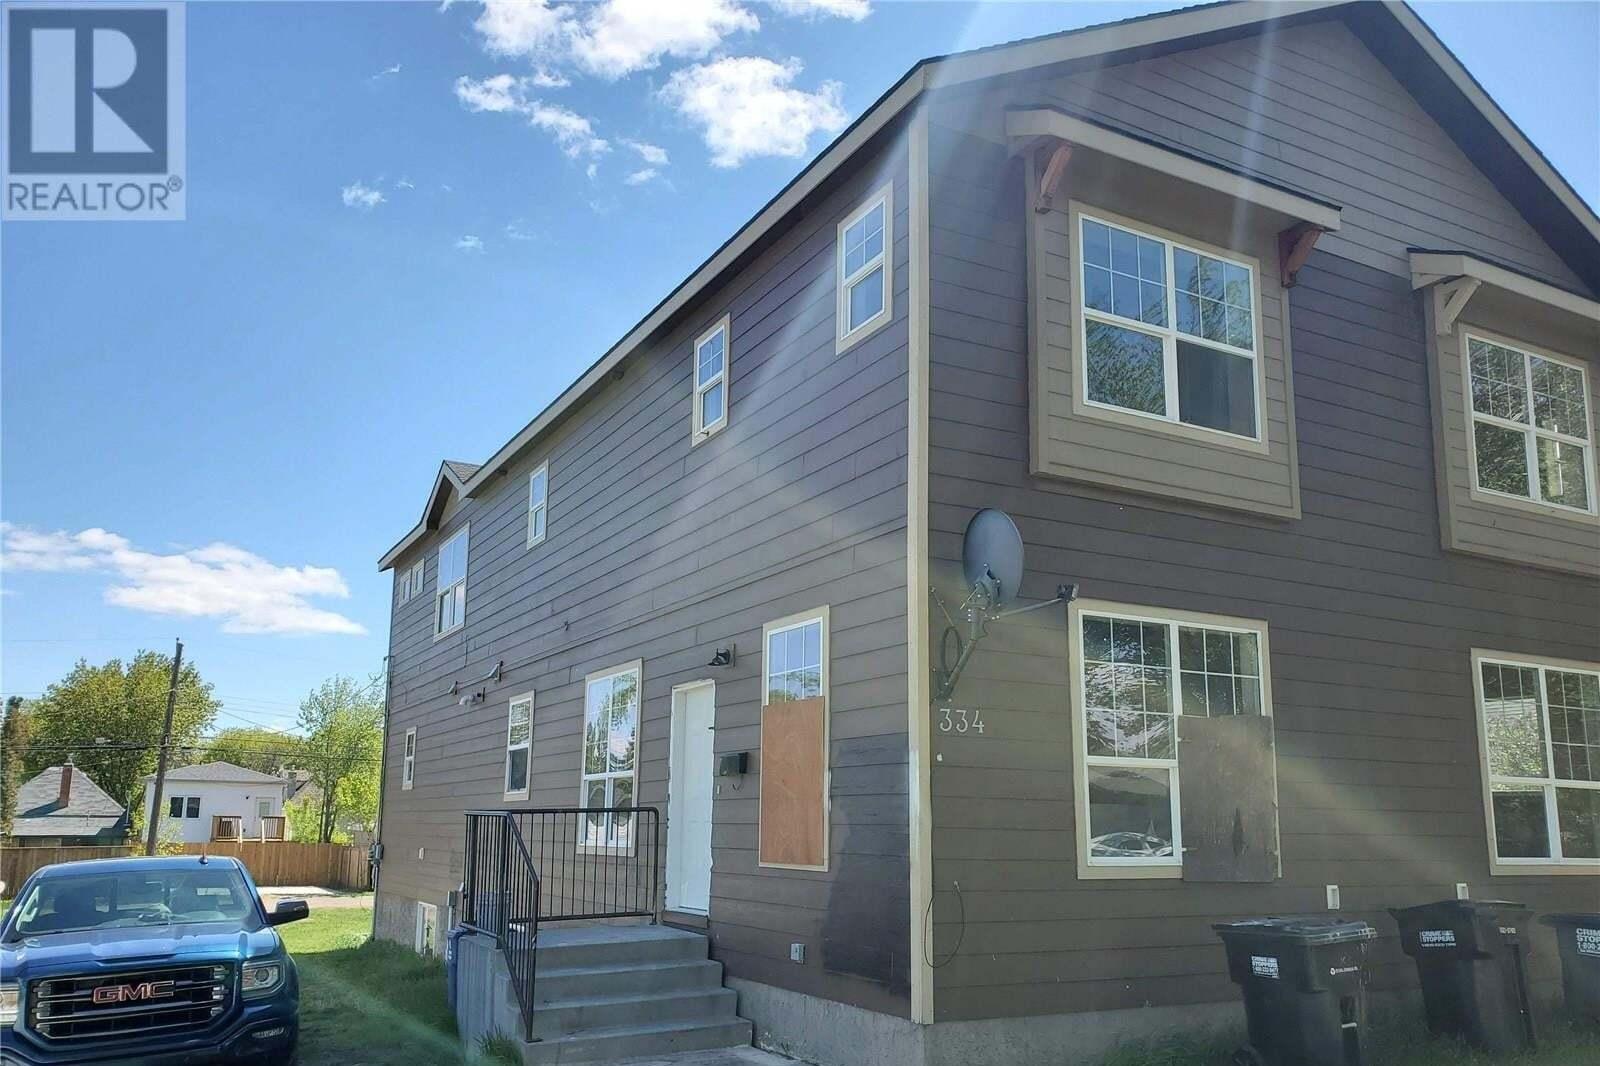 Townhouse for sale at 334 T Ave S Saskatoon Saskatchewan - MLS: SK809931